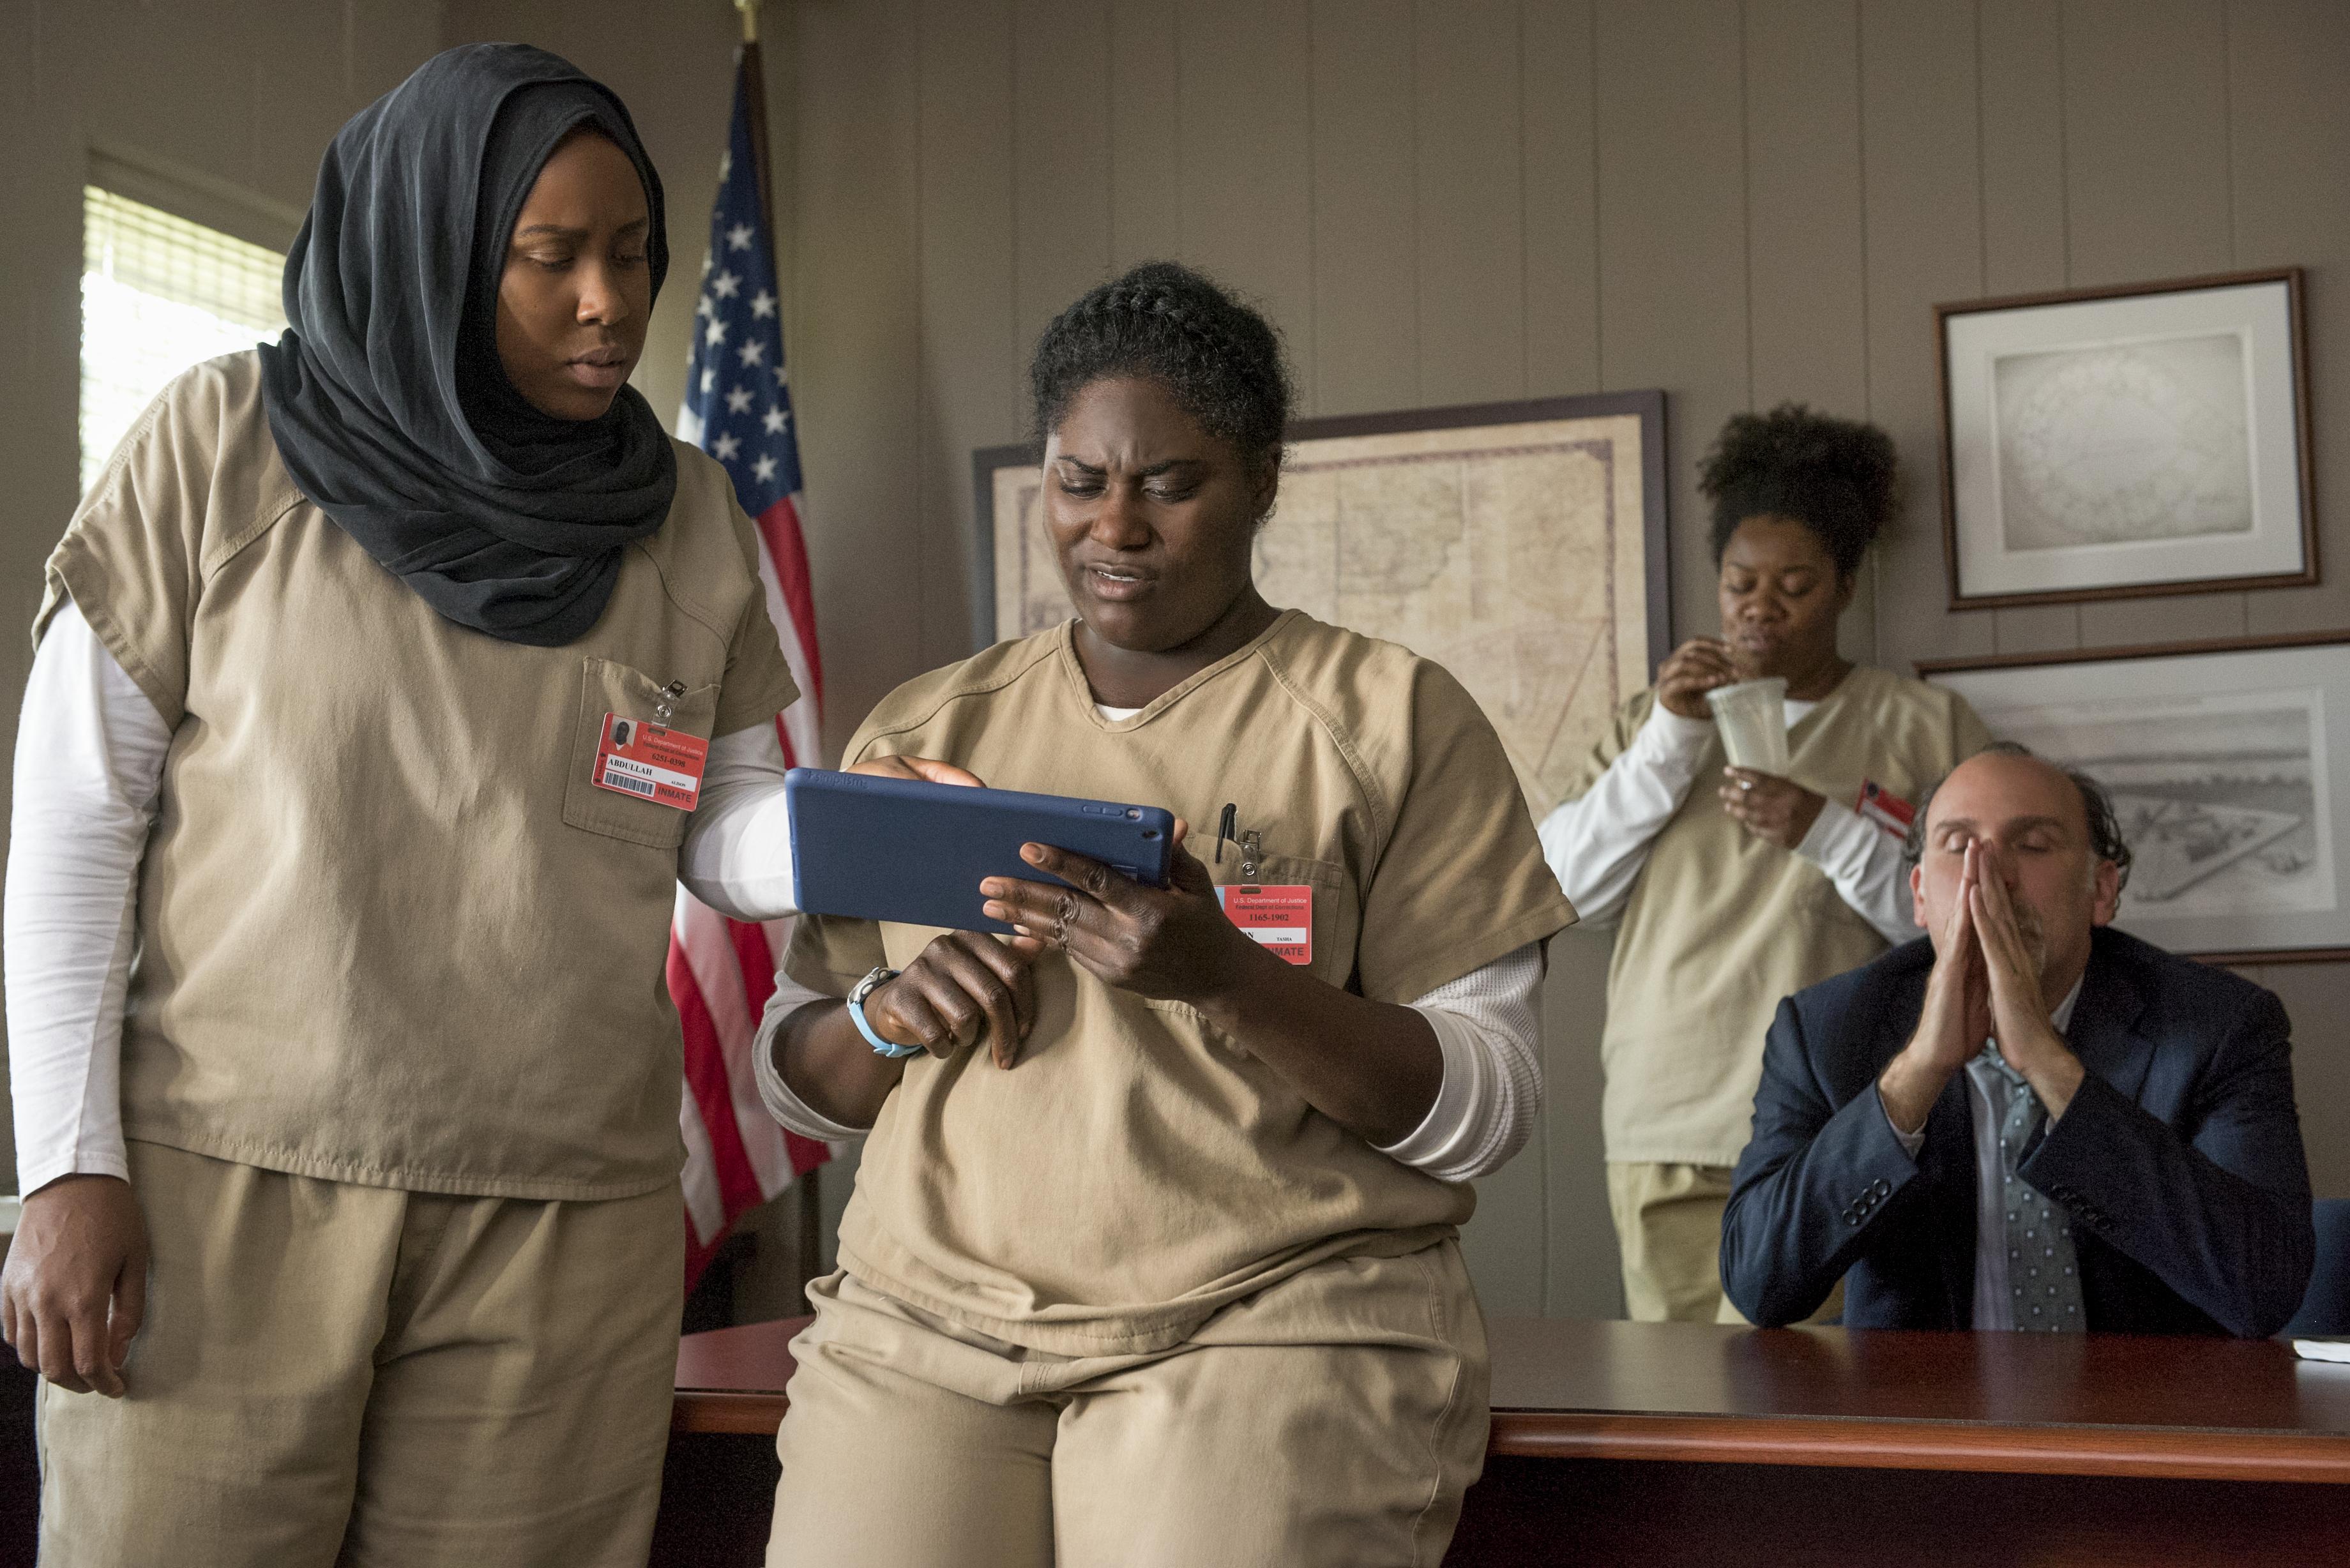 In 'Orange is the New Black' season five, the show takes its darkest